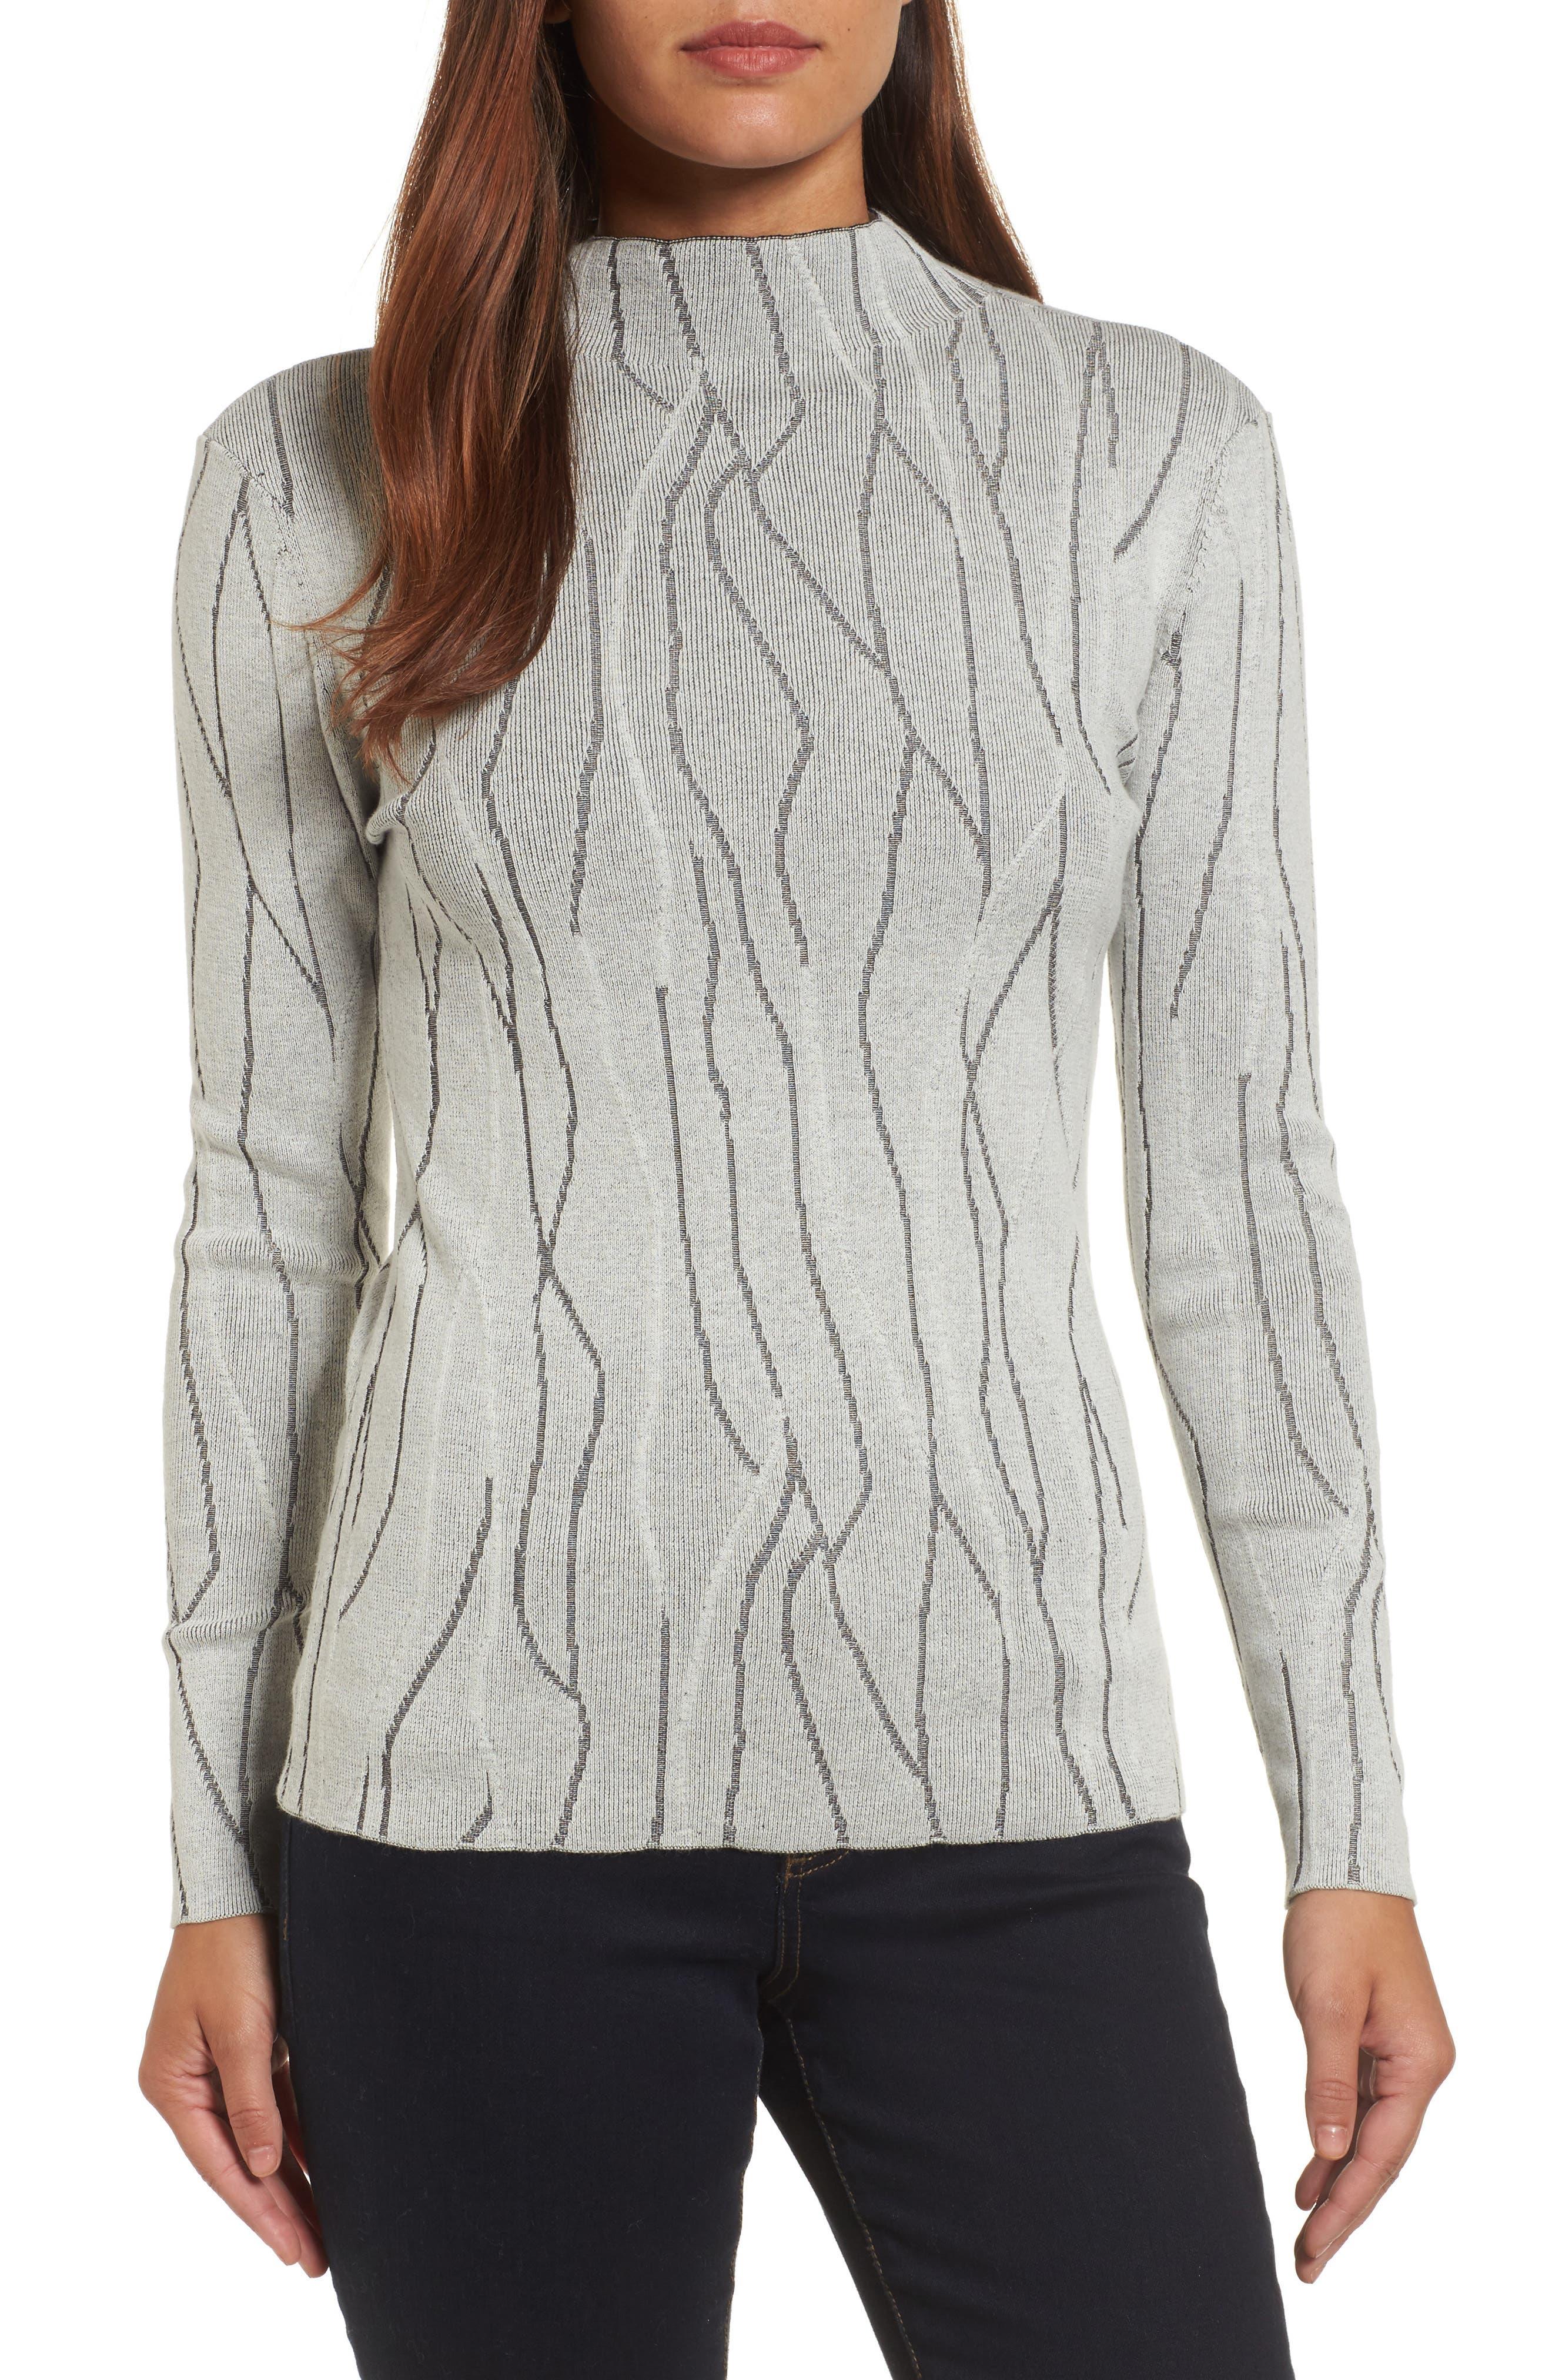 Alternate Image 1 Selected - NIC+ZOE Artisanal Crackle Jacquard Sweater (Regular & Petite)